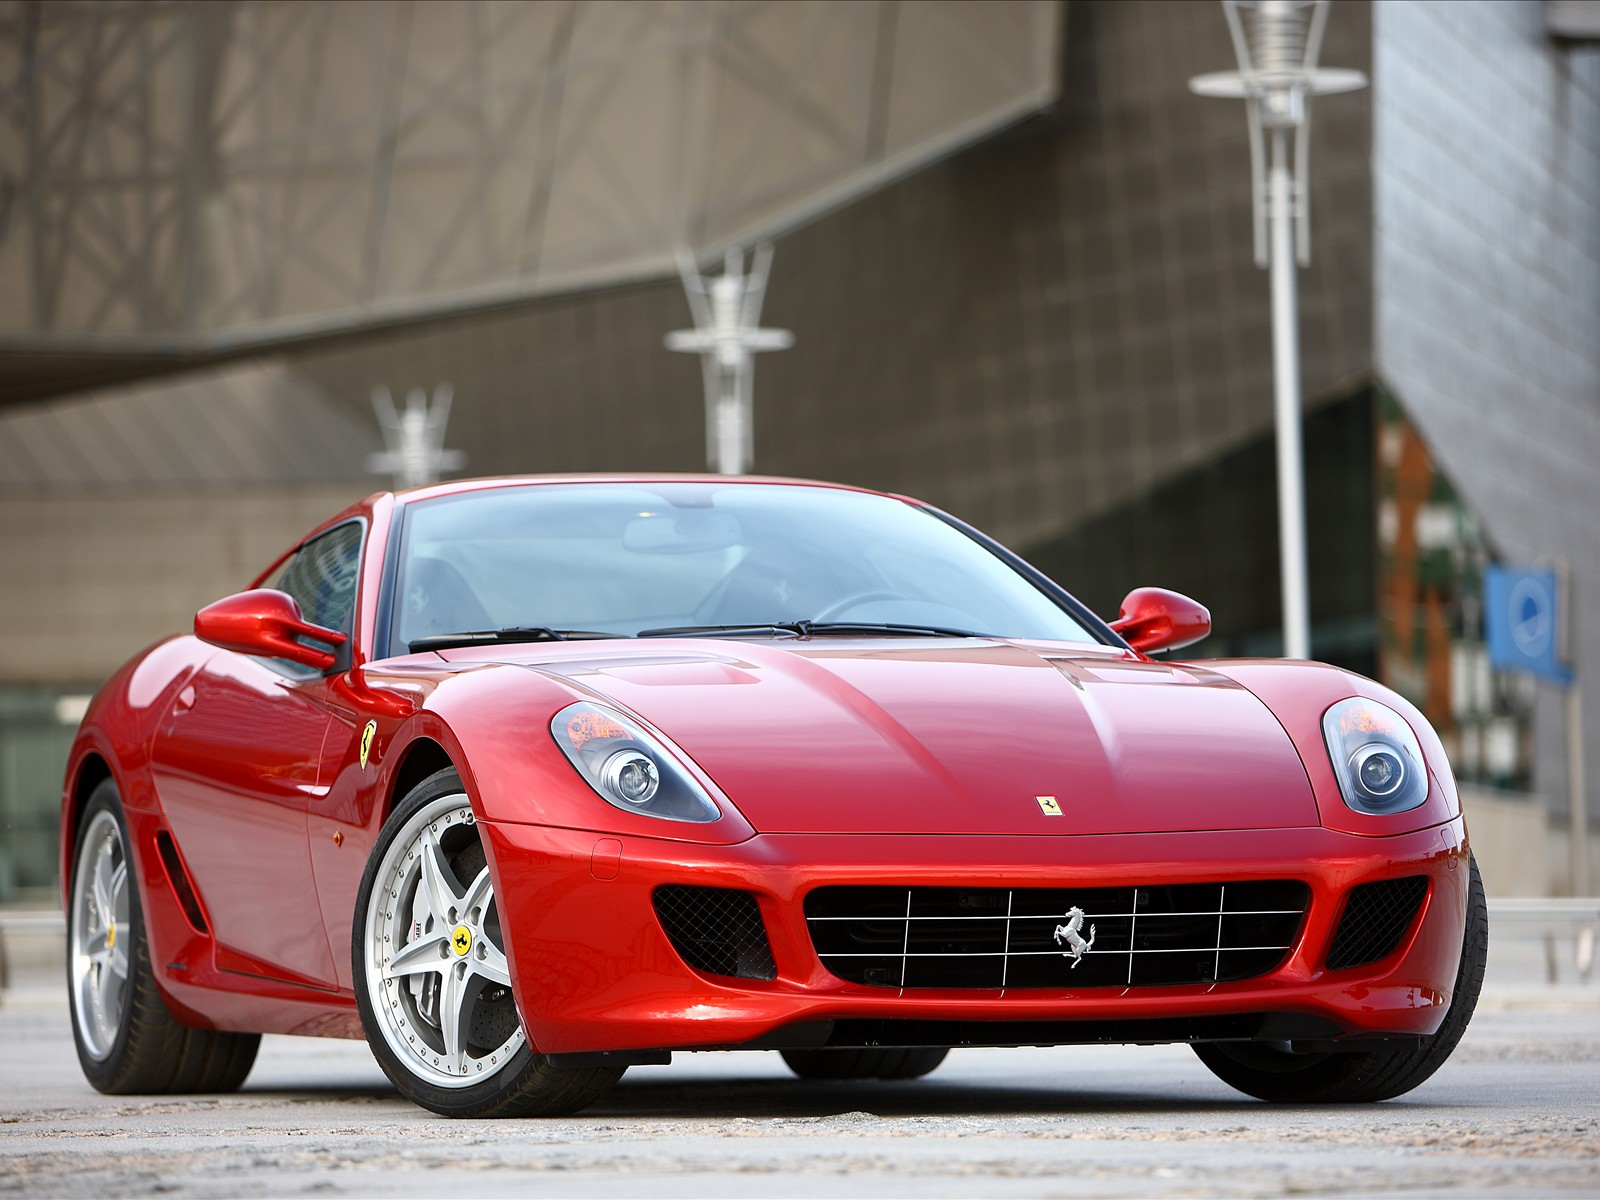 Super cars 2010 ferrari 599 gtb fiorano hgte 2010 ferrari 599 gtb fiorano hgte vanachro Gallery